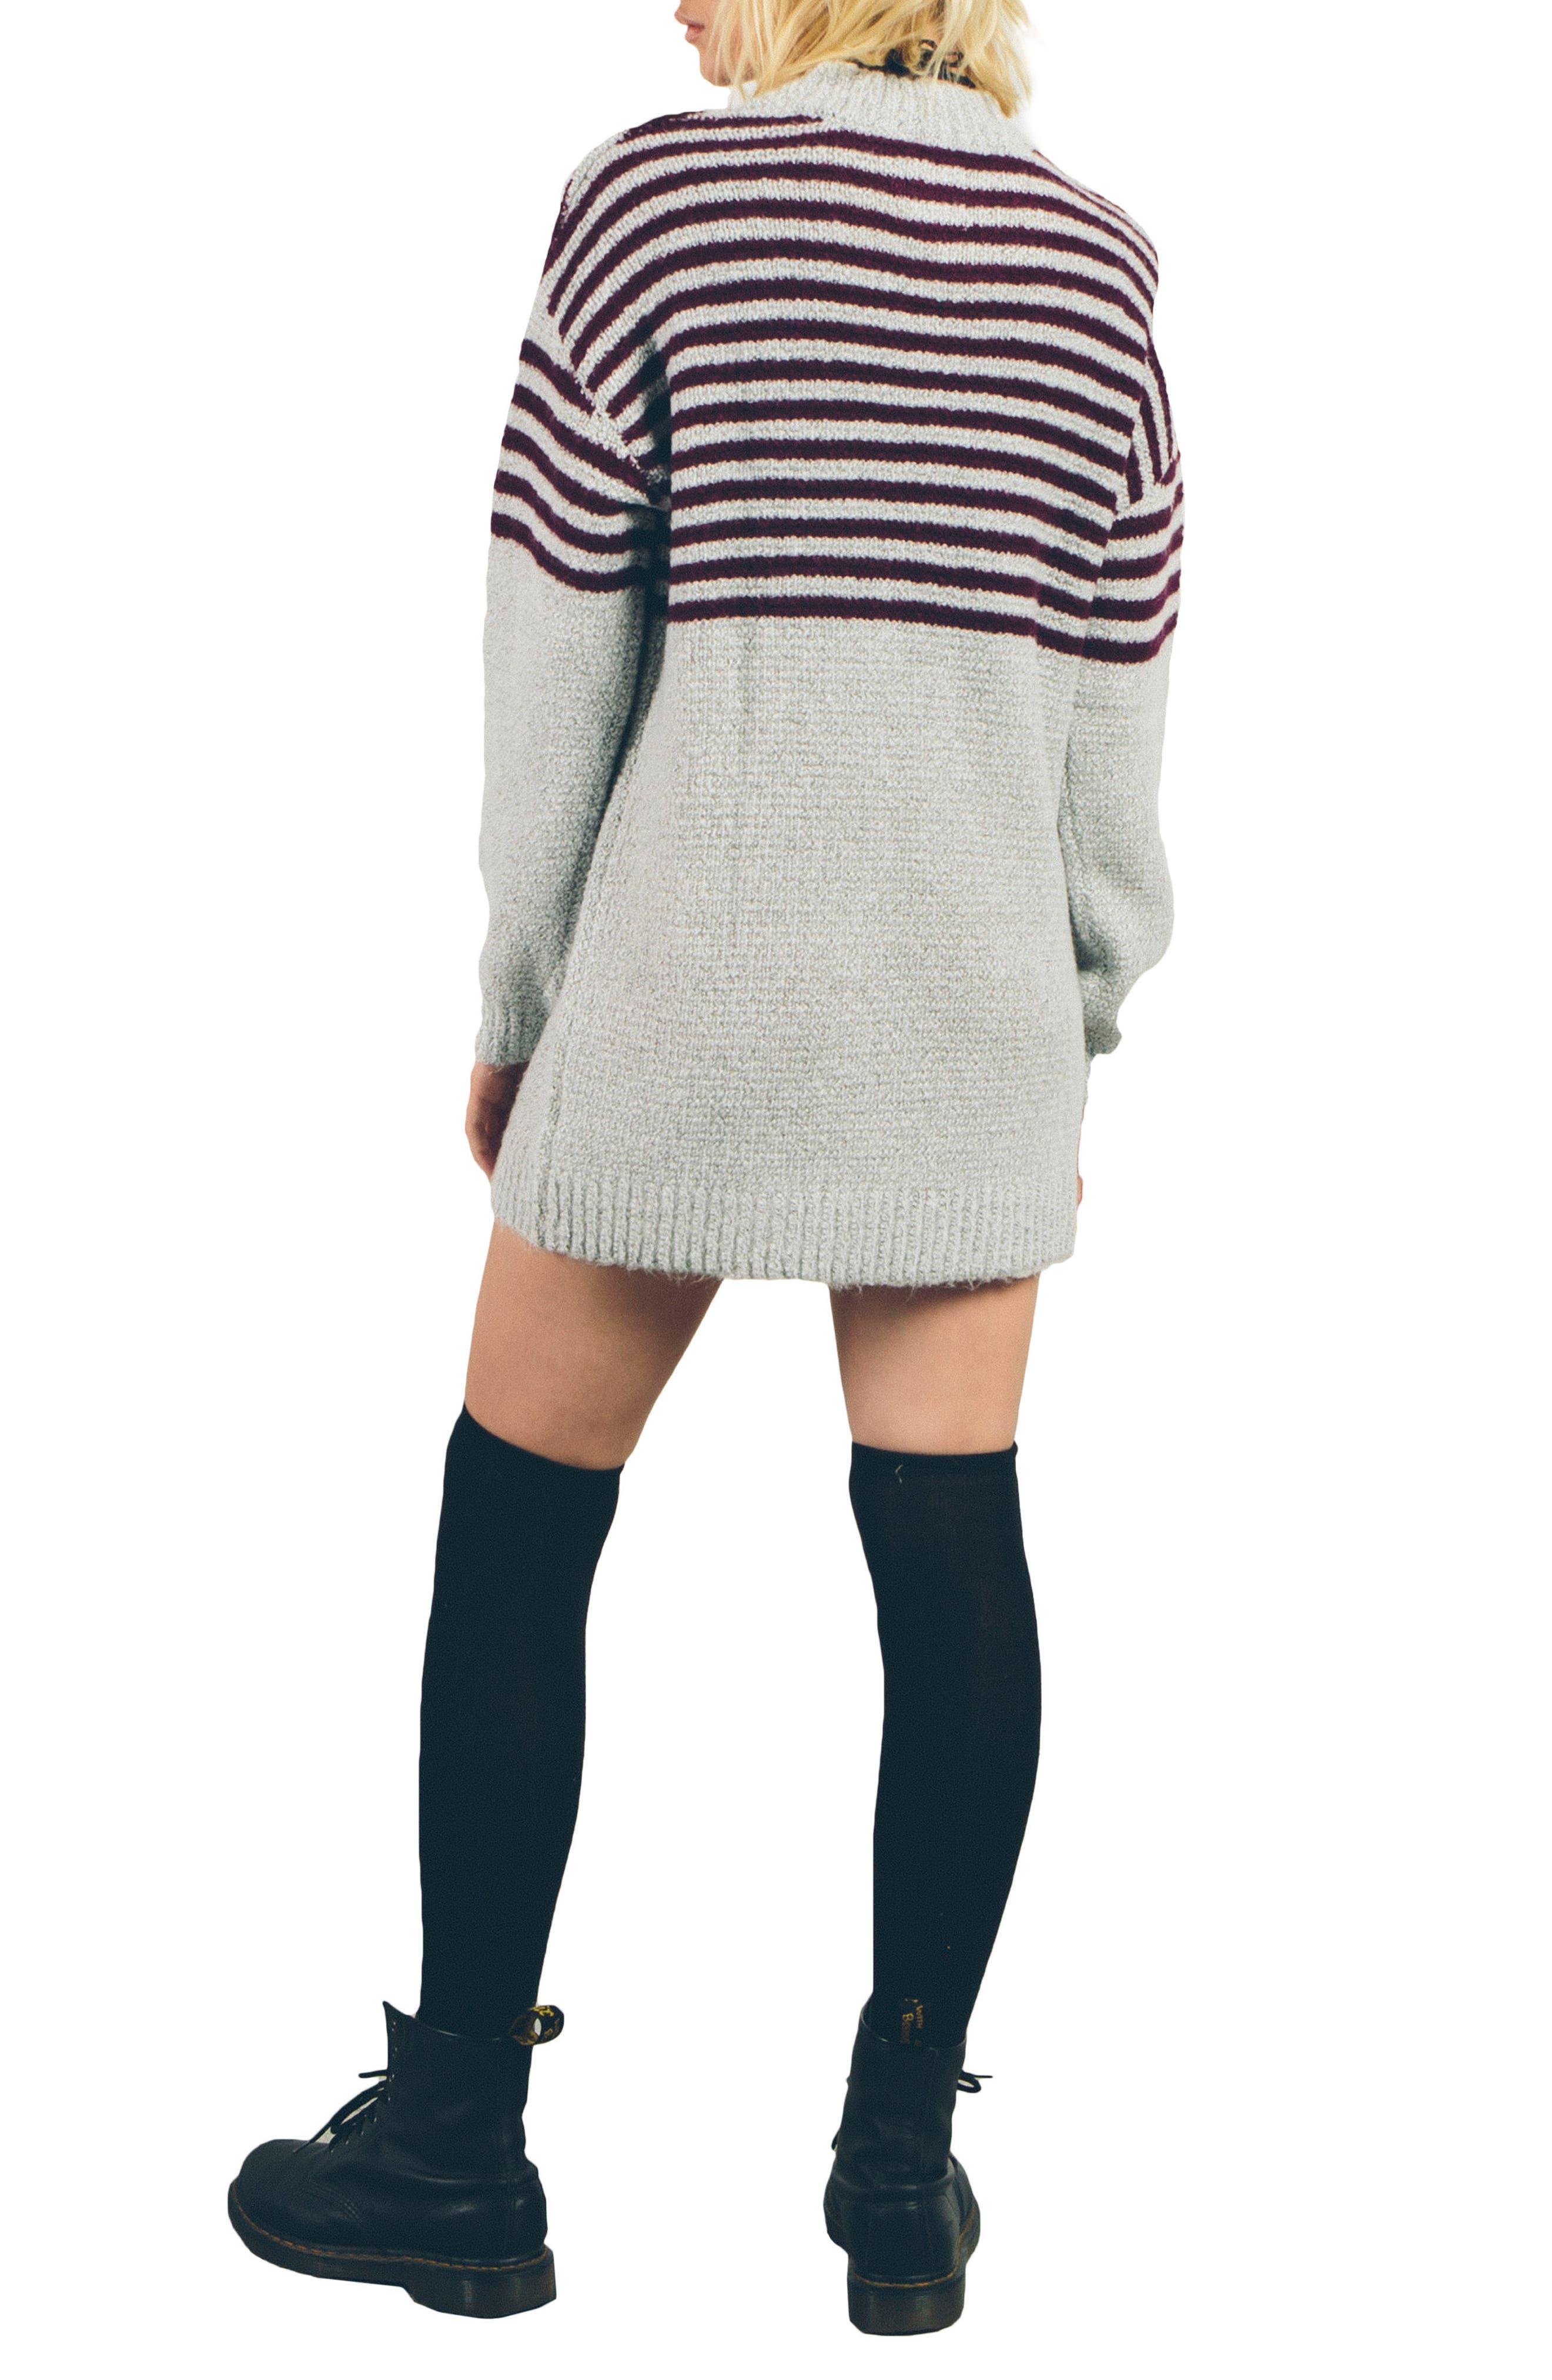 Cold Daze Knit Dress,                             Alternate thumbnail 2, color,                             Heather Grey